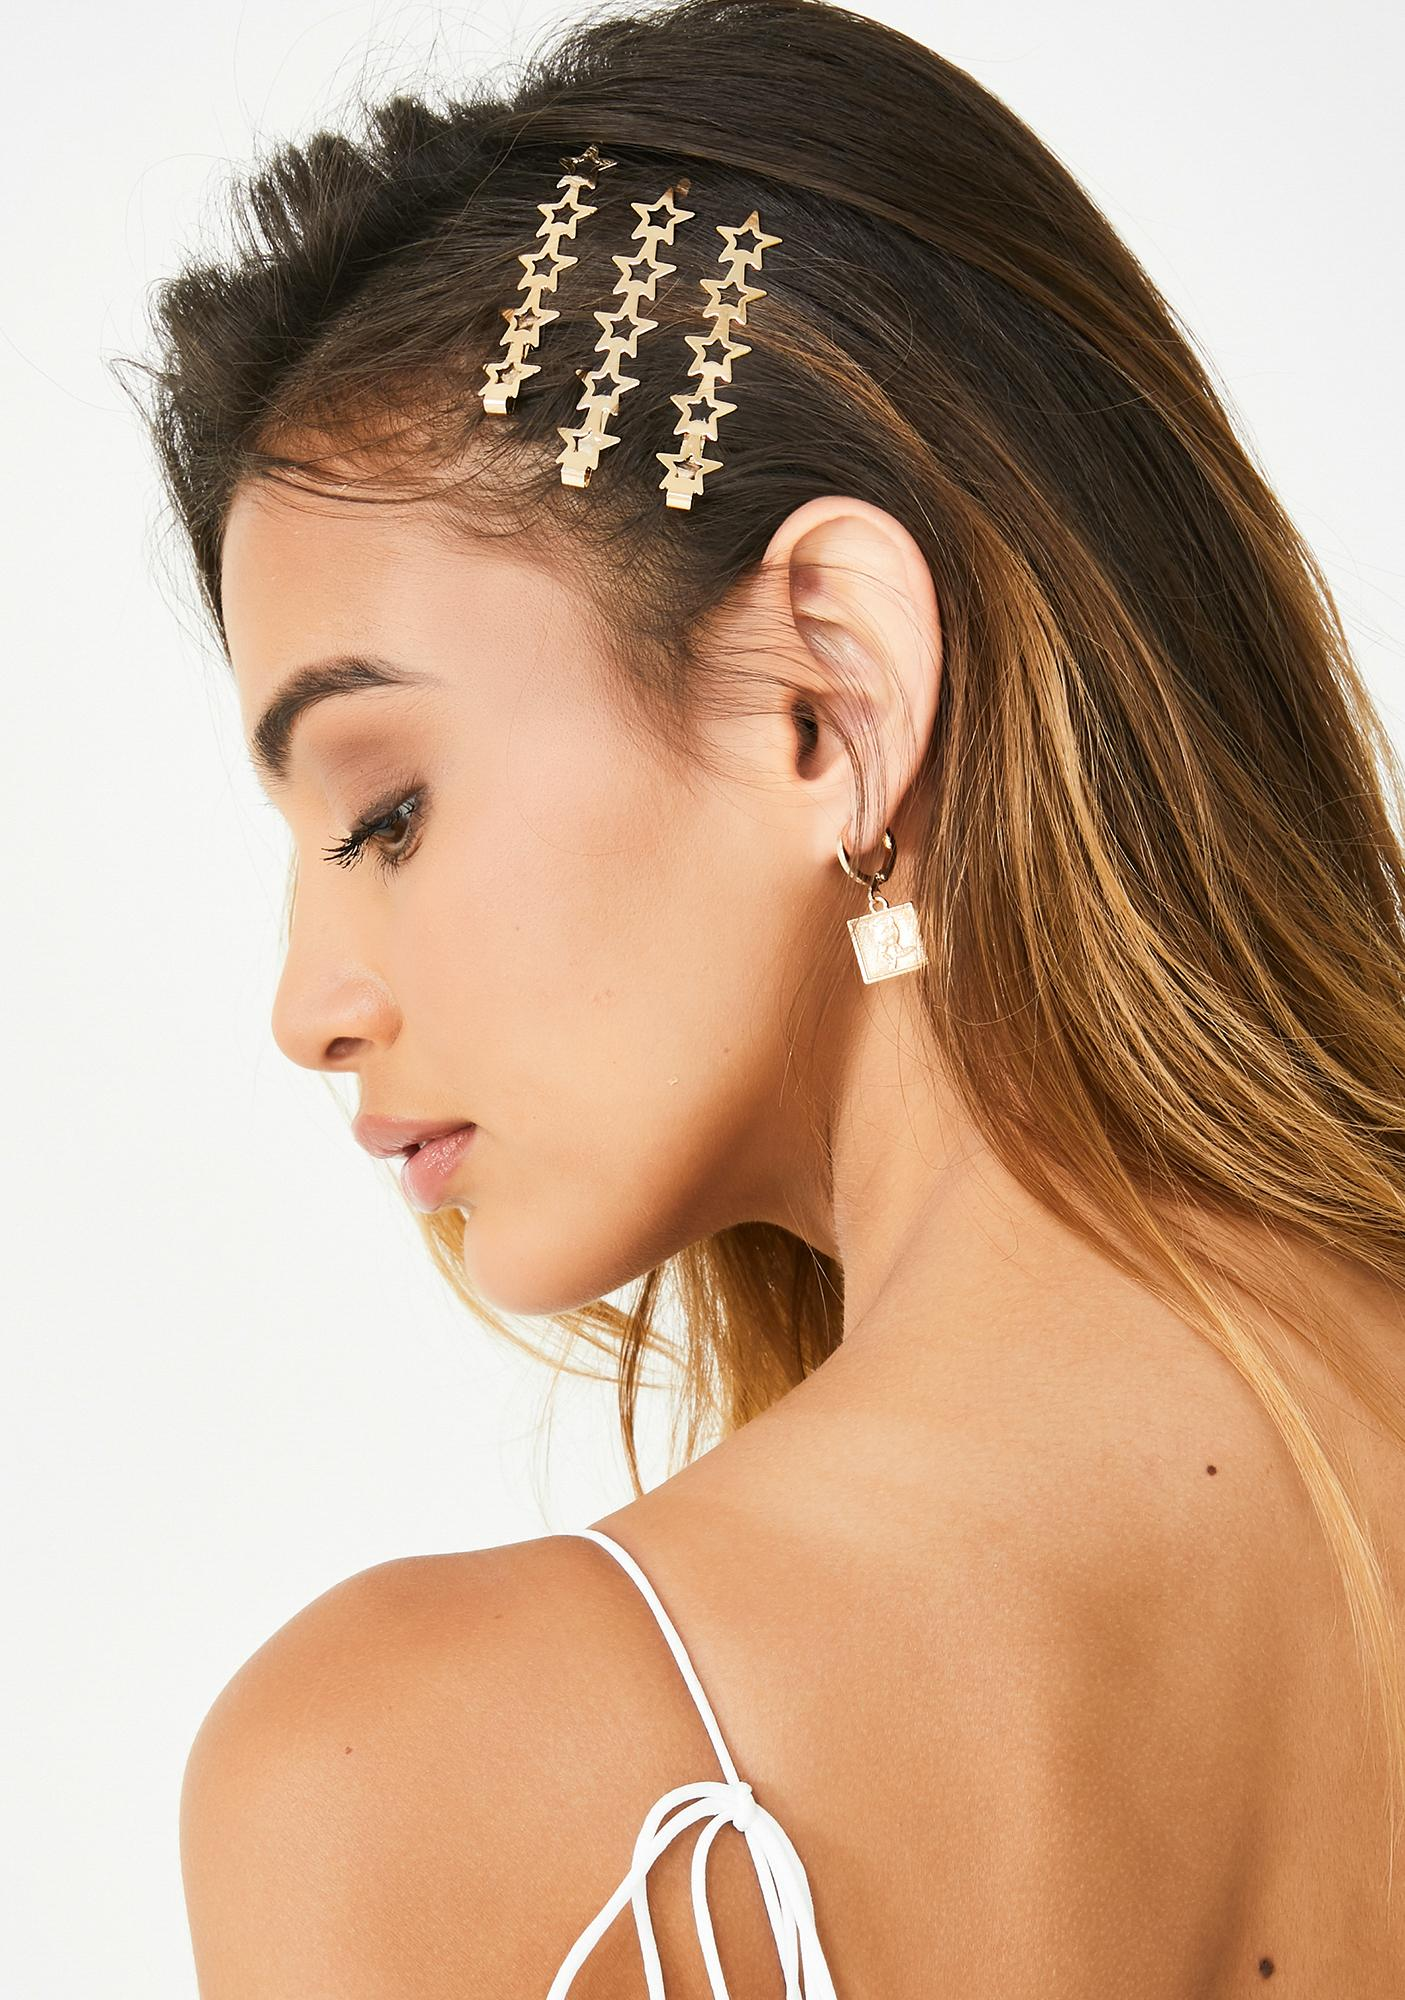 Golden Star Bright Hair Pin Set